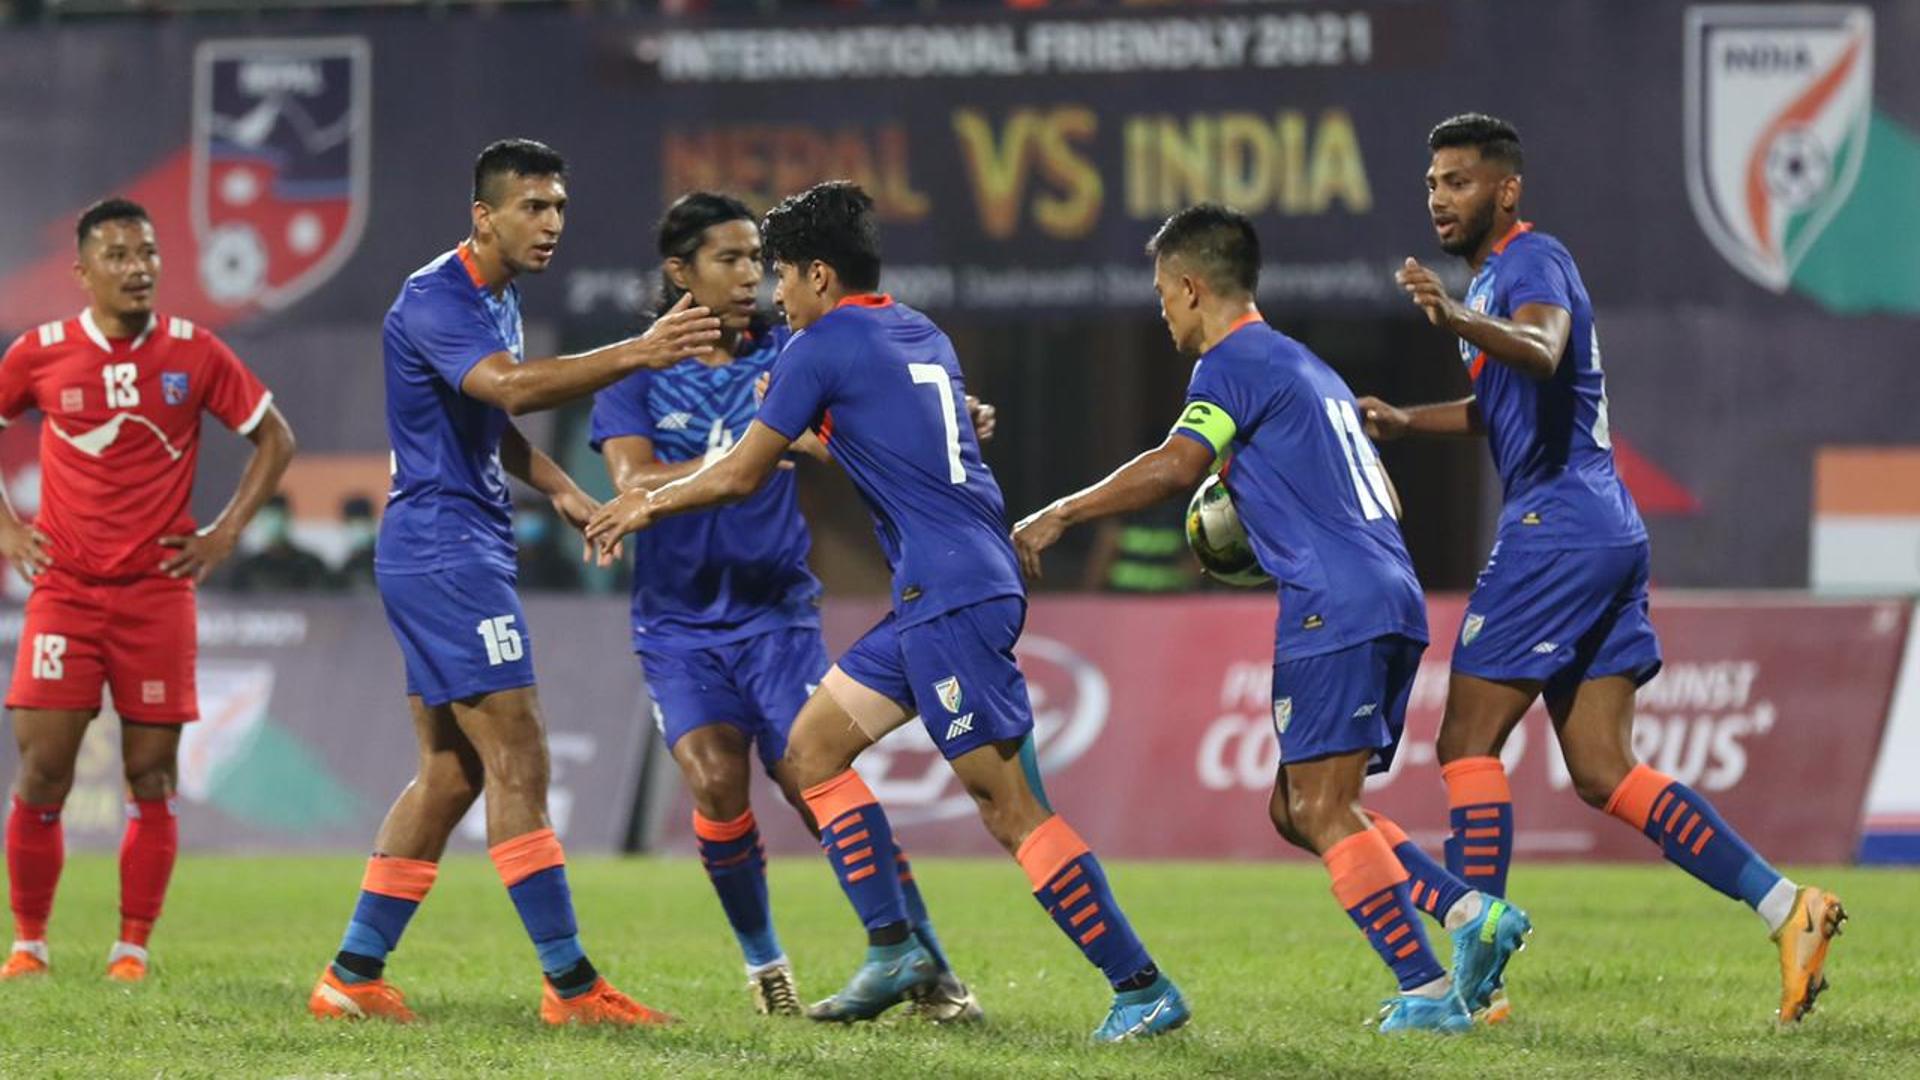 Nepal 1-1 India: Anirudh Thapa salvages a draw against the Gorkhalis    Goal.com